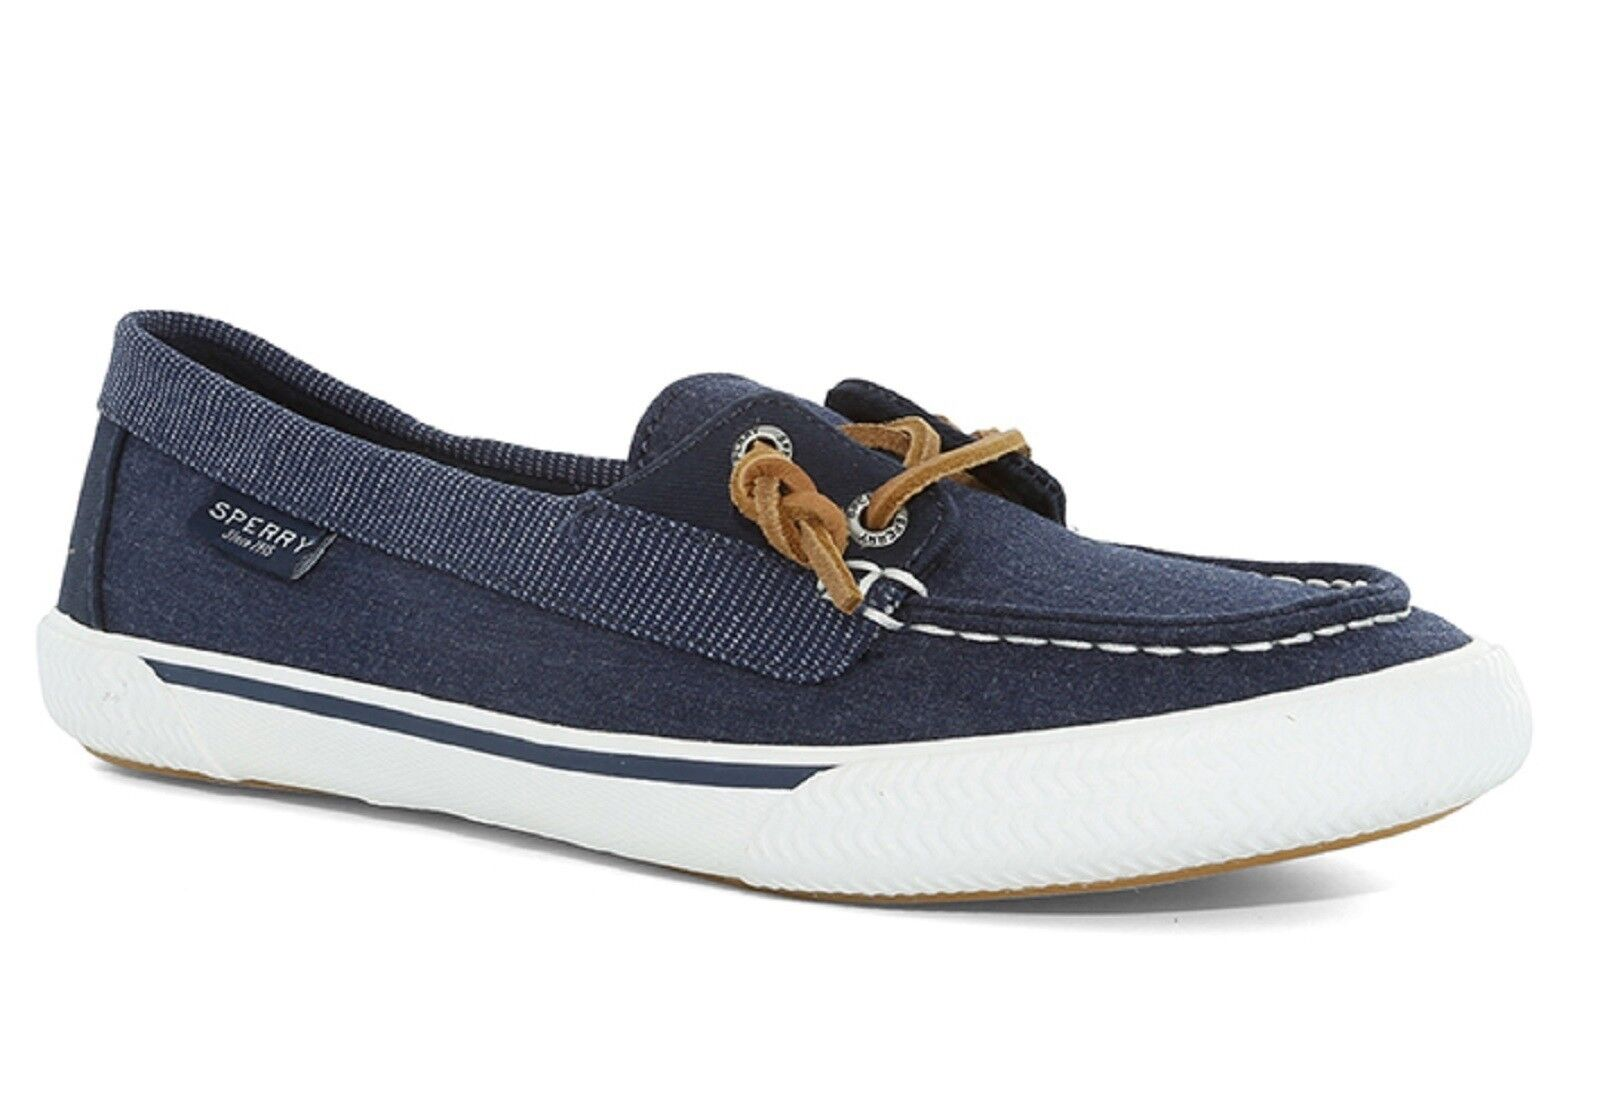 SPERRY 'Quest Rhythm' Ladies Canvas Boat shoes Navy    Sz. 9.5  M    NIB